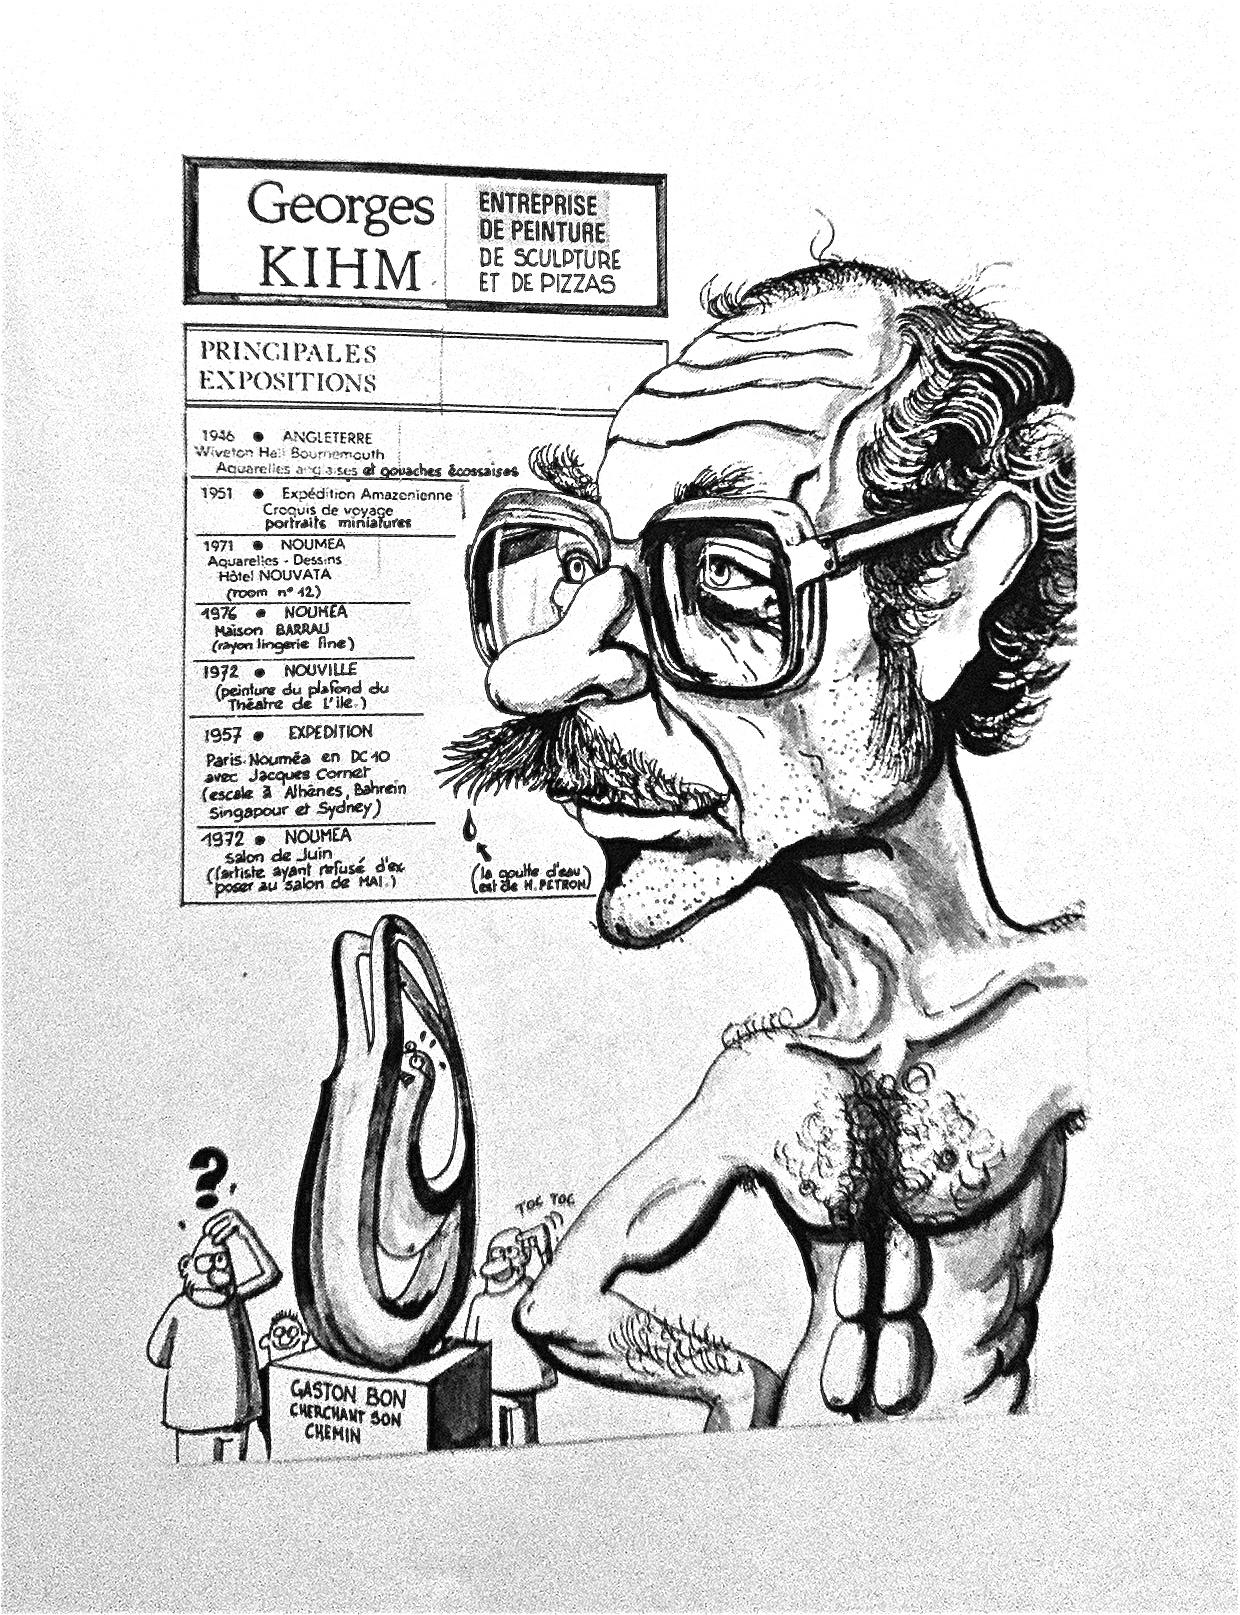 Georges Kihm